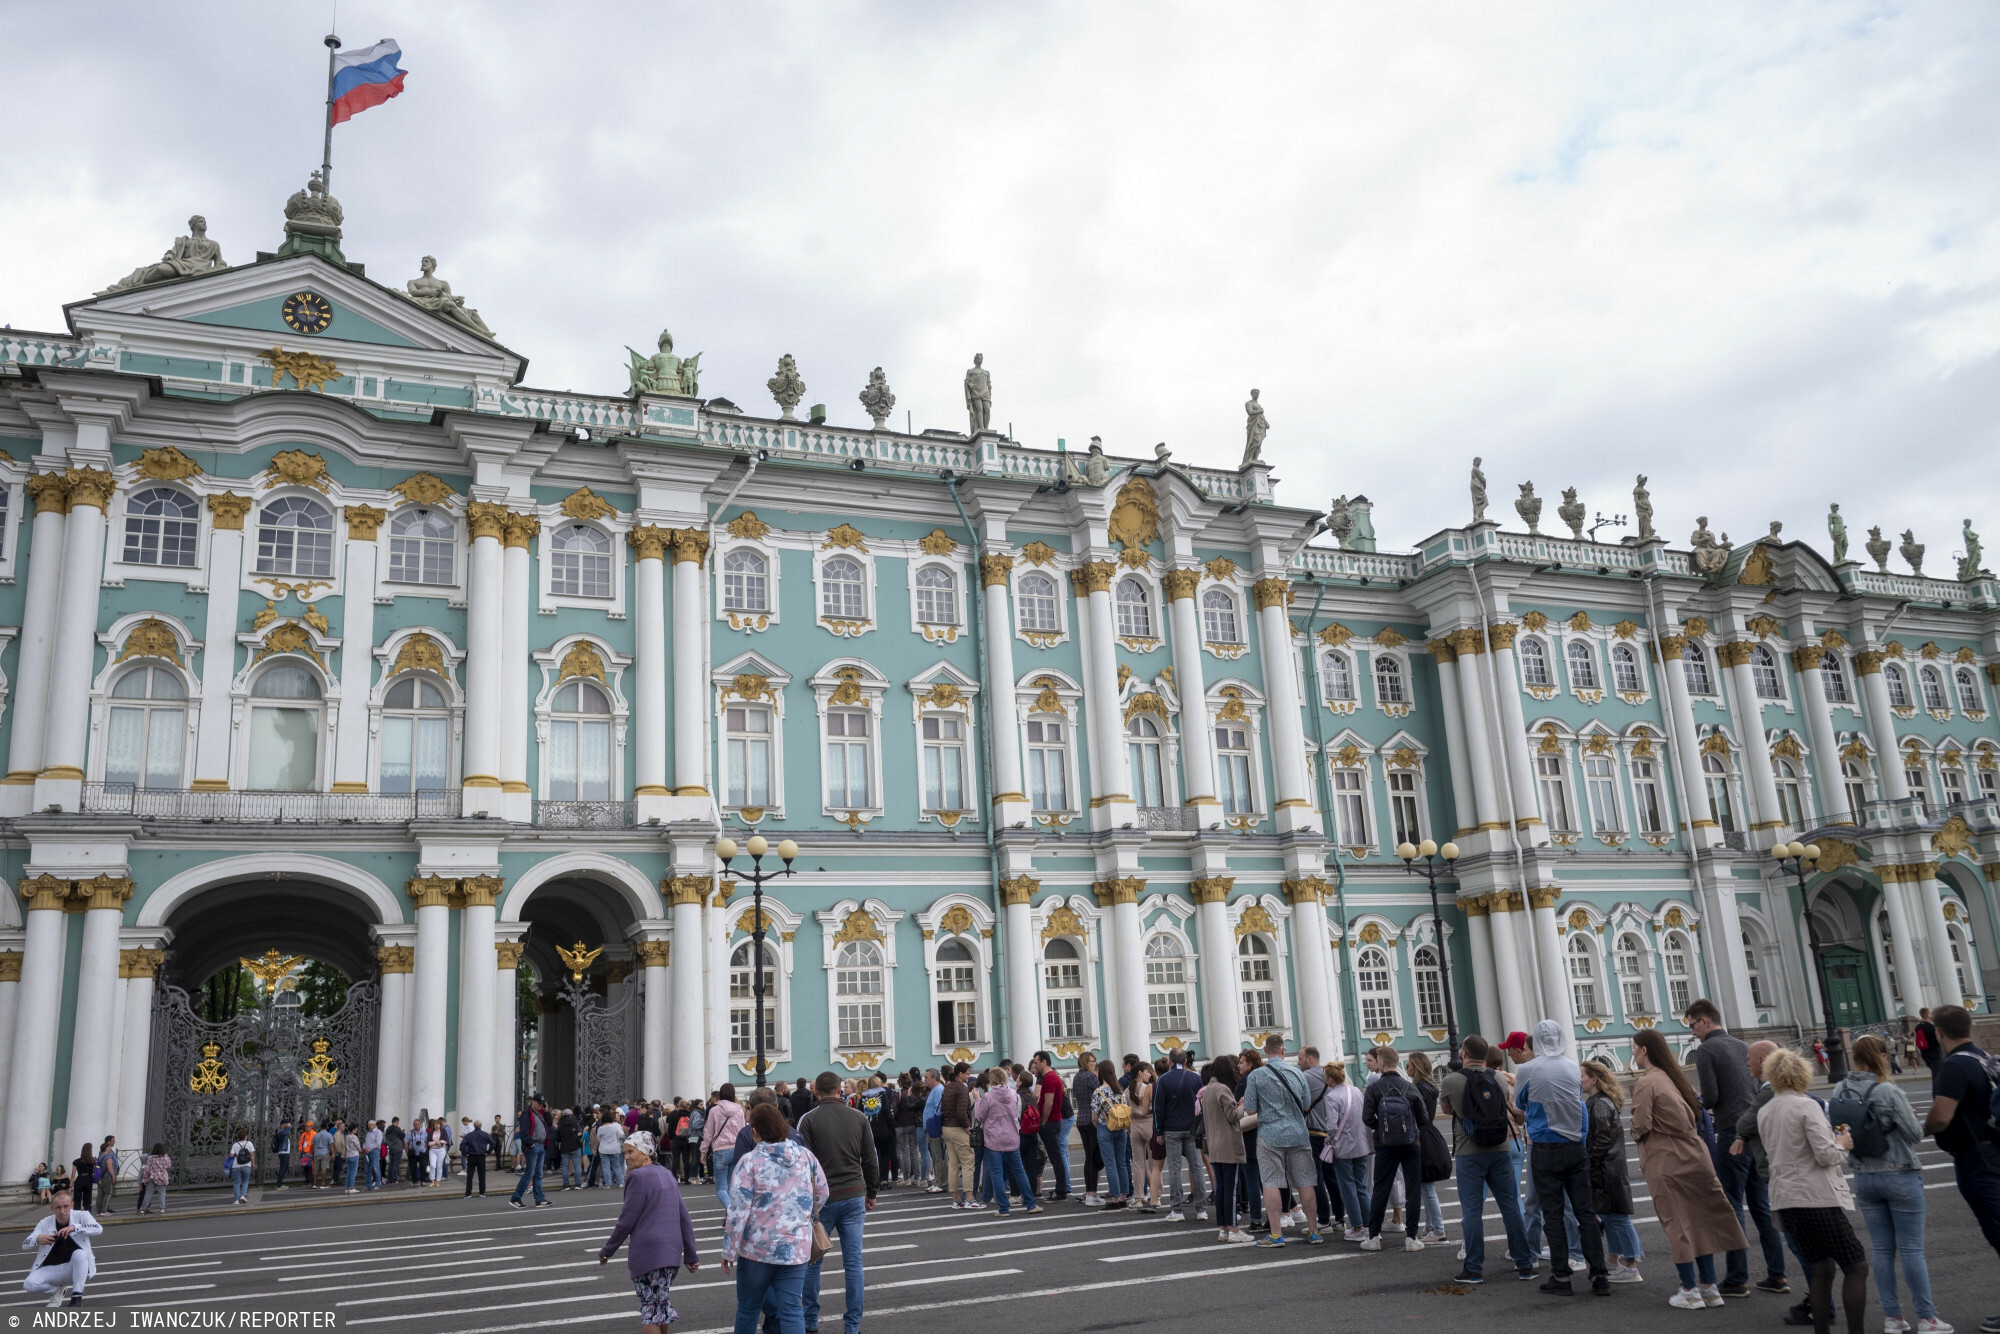 15.06.2021 Rosja, Sankt Petersburg , Ermitaz fot. Andrzej Iwanczuk/REPORTER